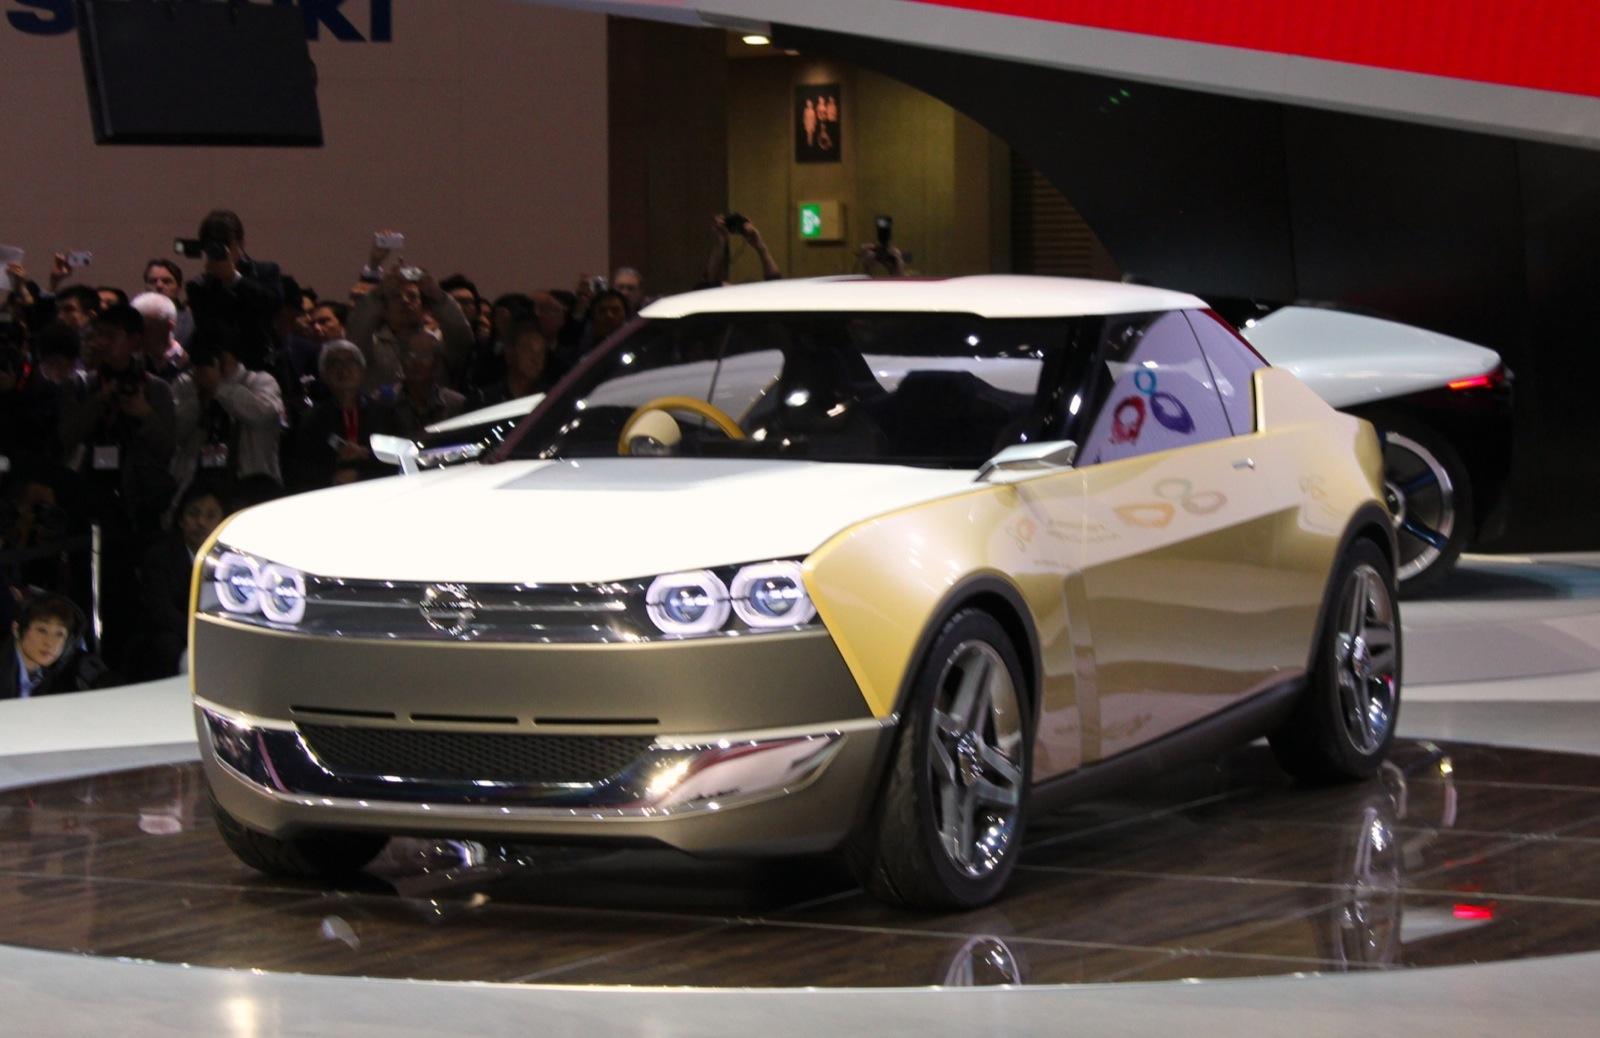 Nissan Reveals Retro IDx Freeflow And NISMO Concepts: Video